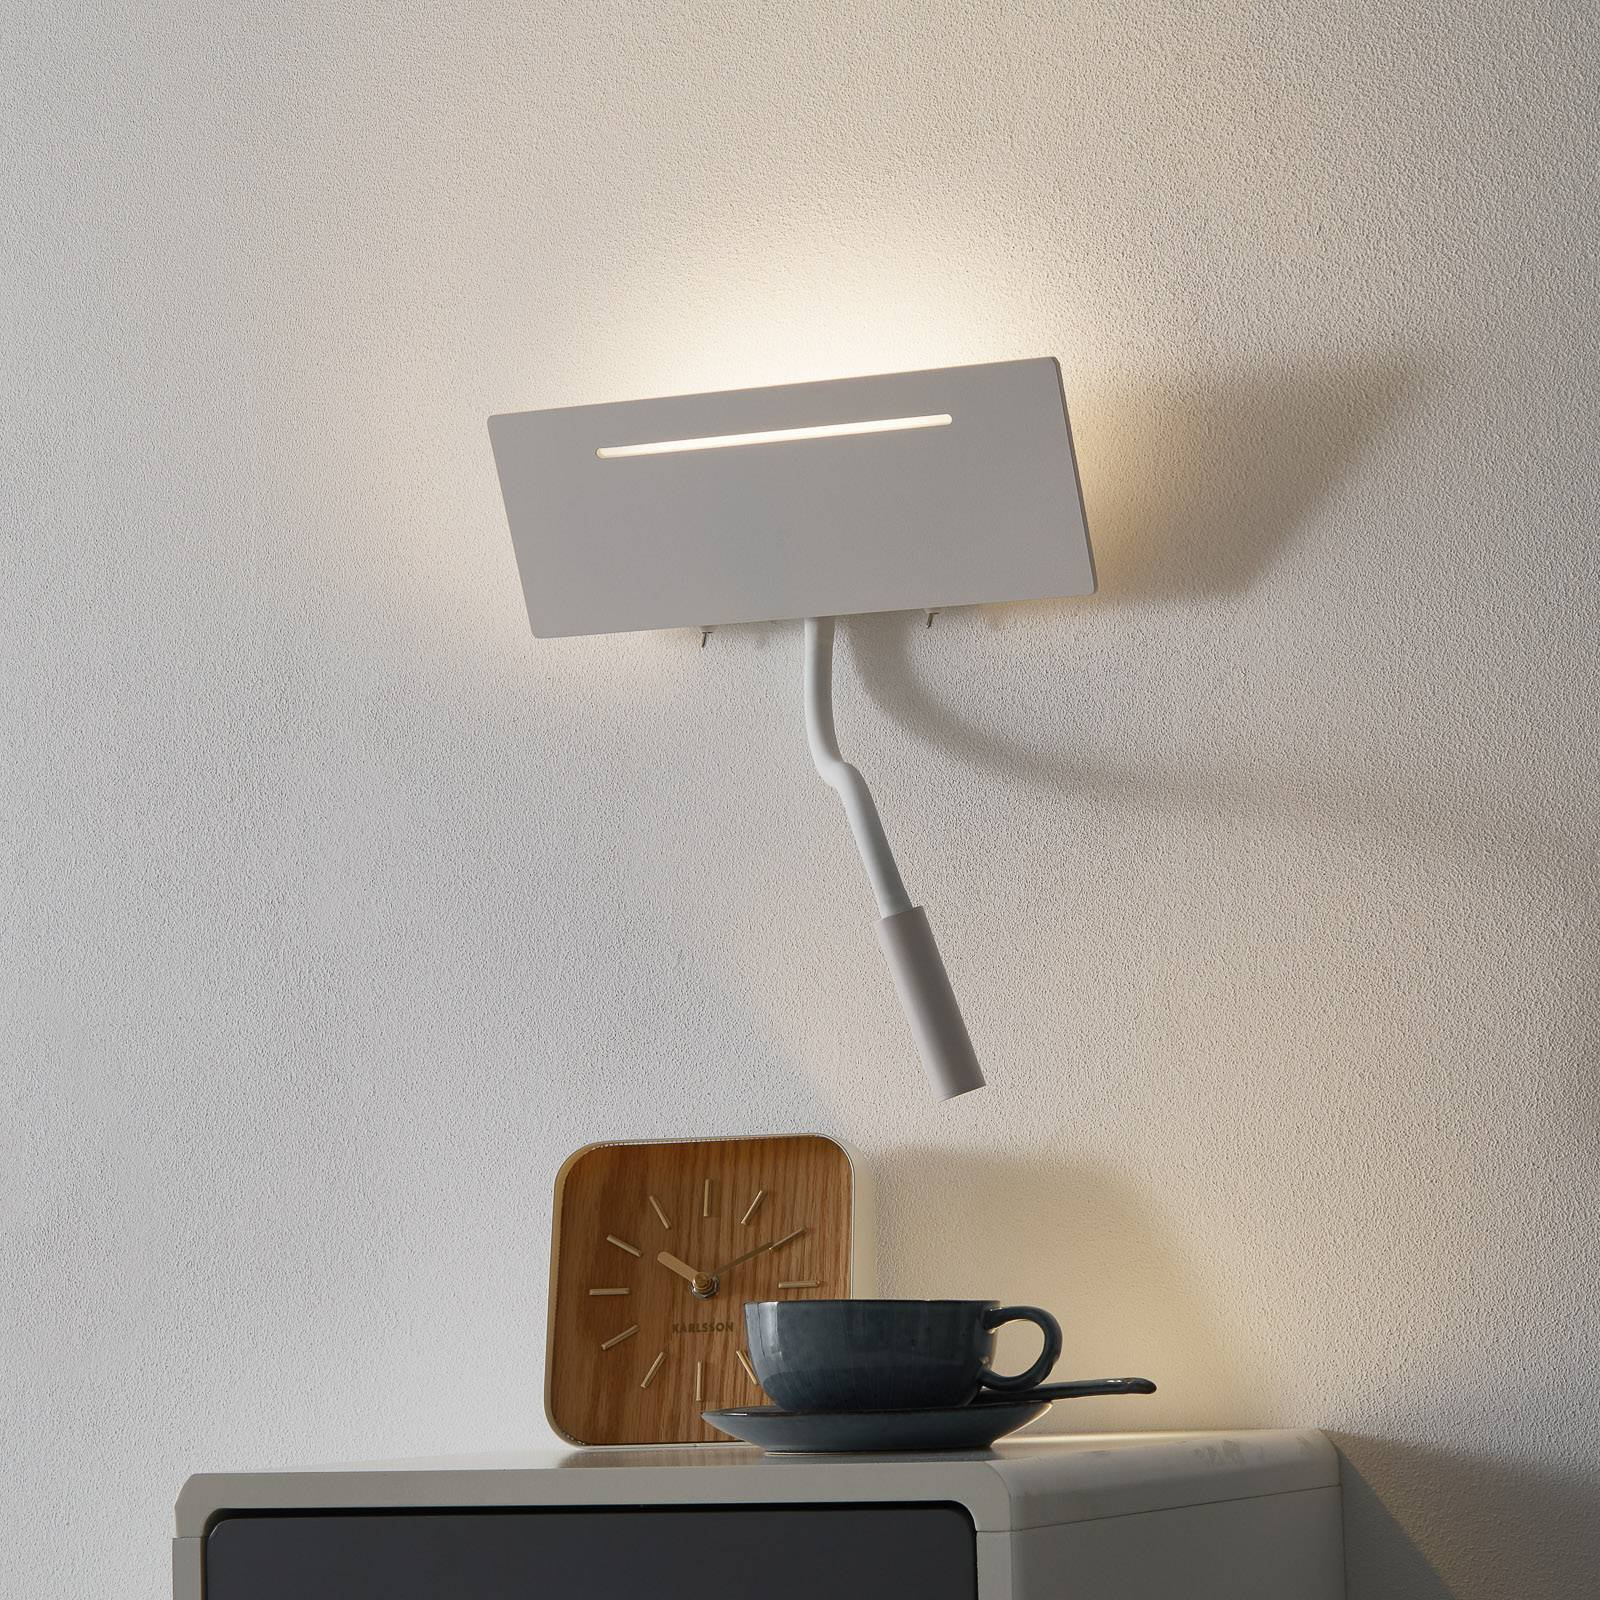 Ariel – hvit LED-vegglampe med leselampe